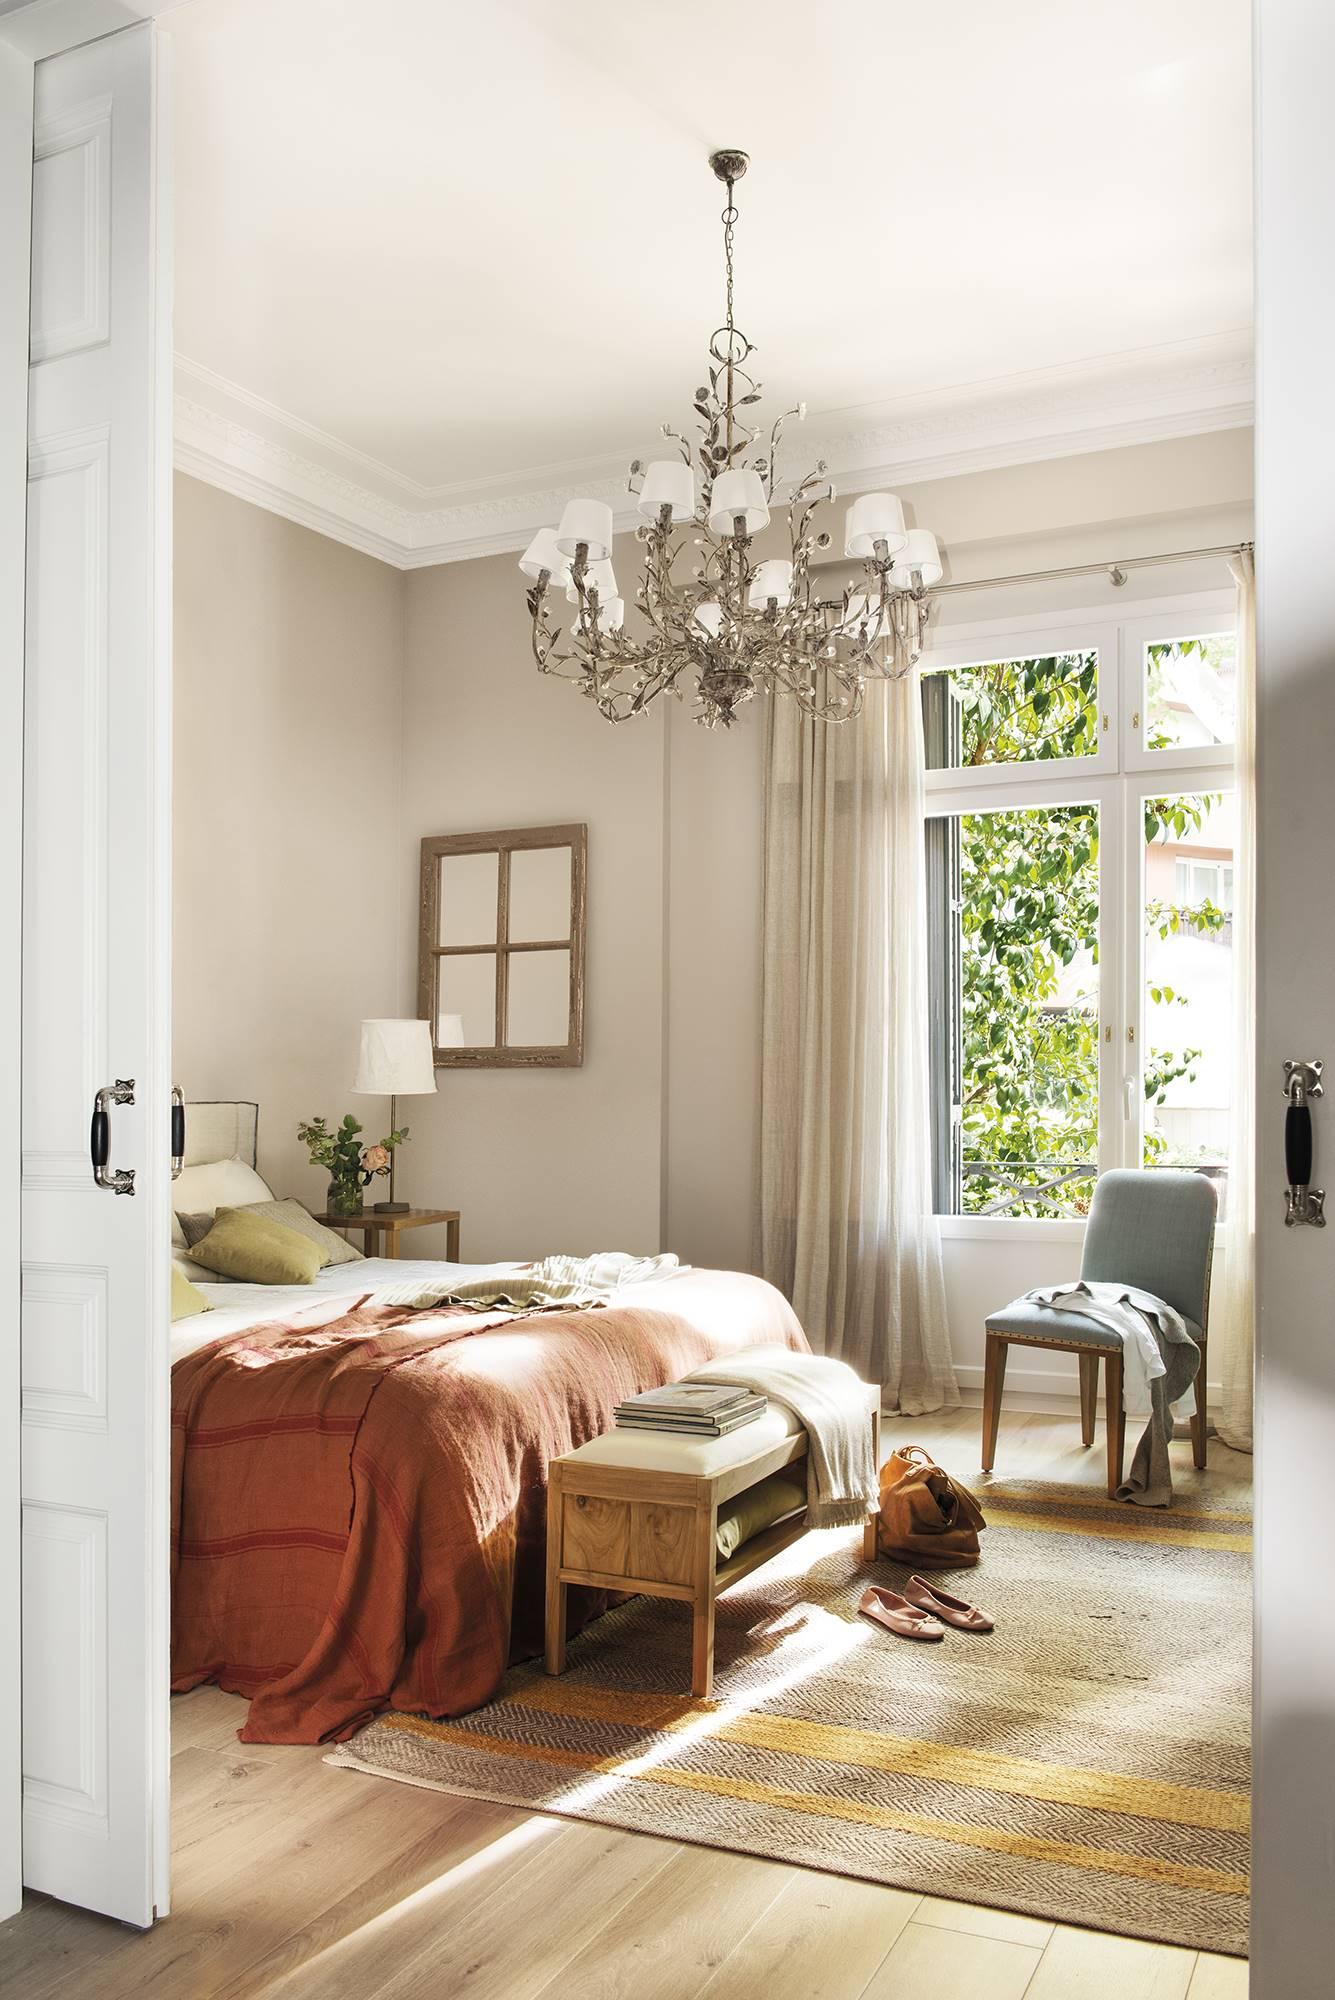 dormitor cu tavan înalt